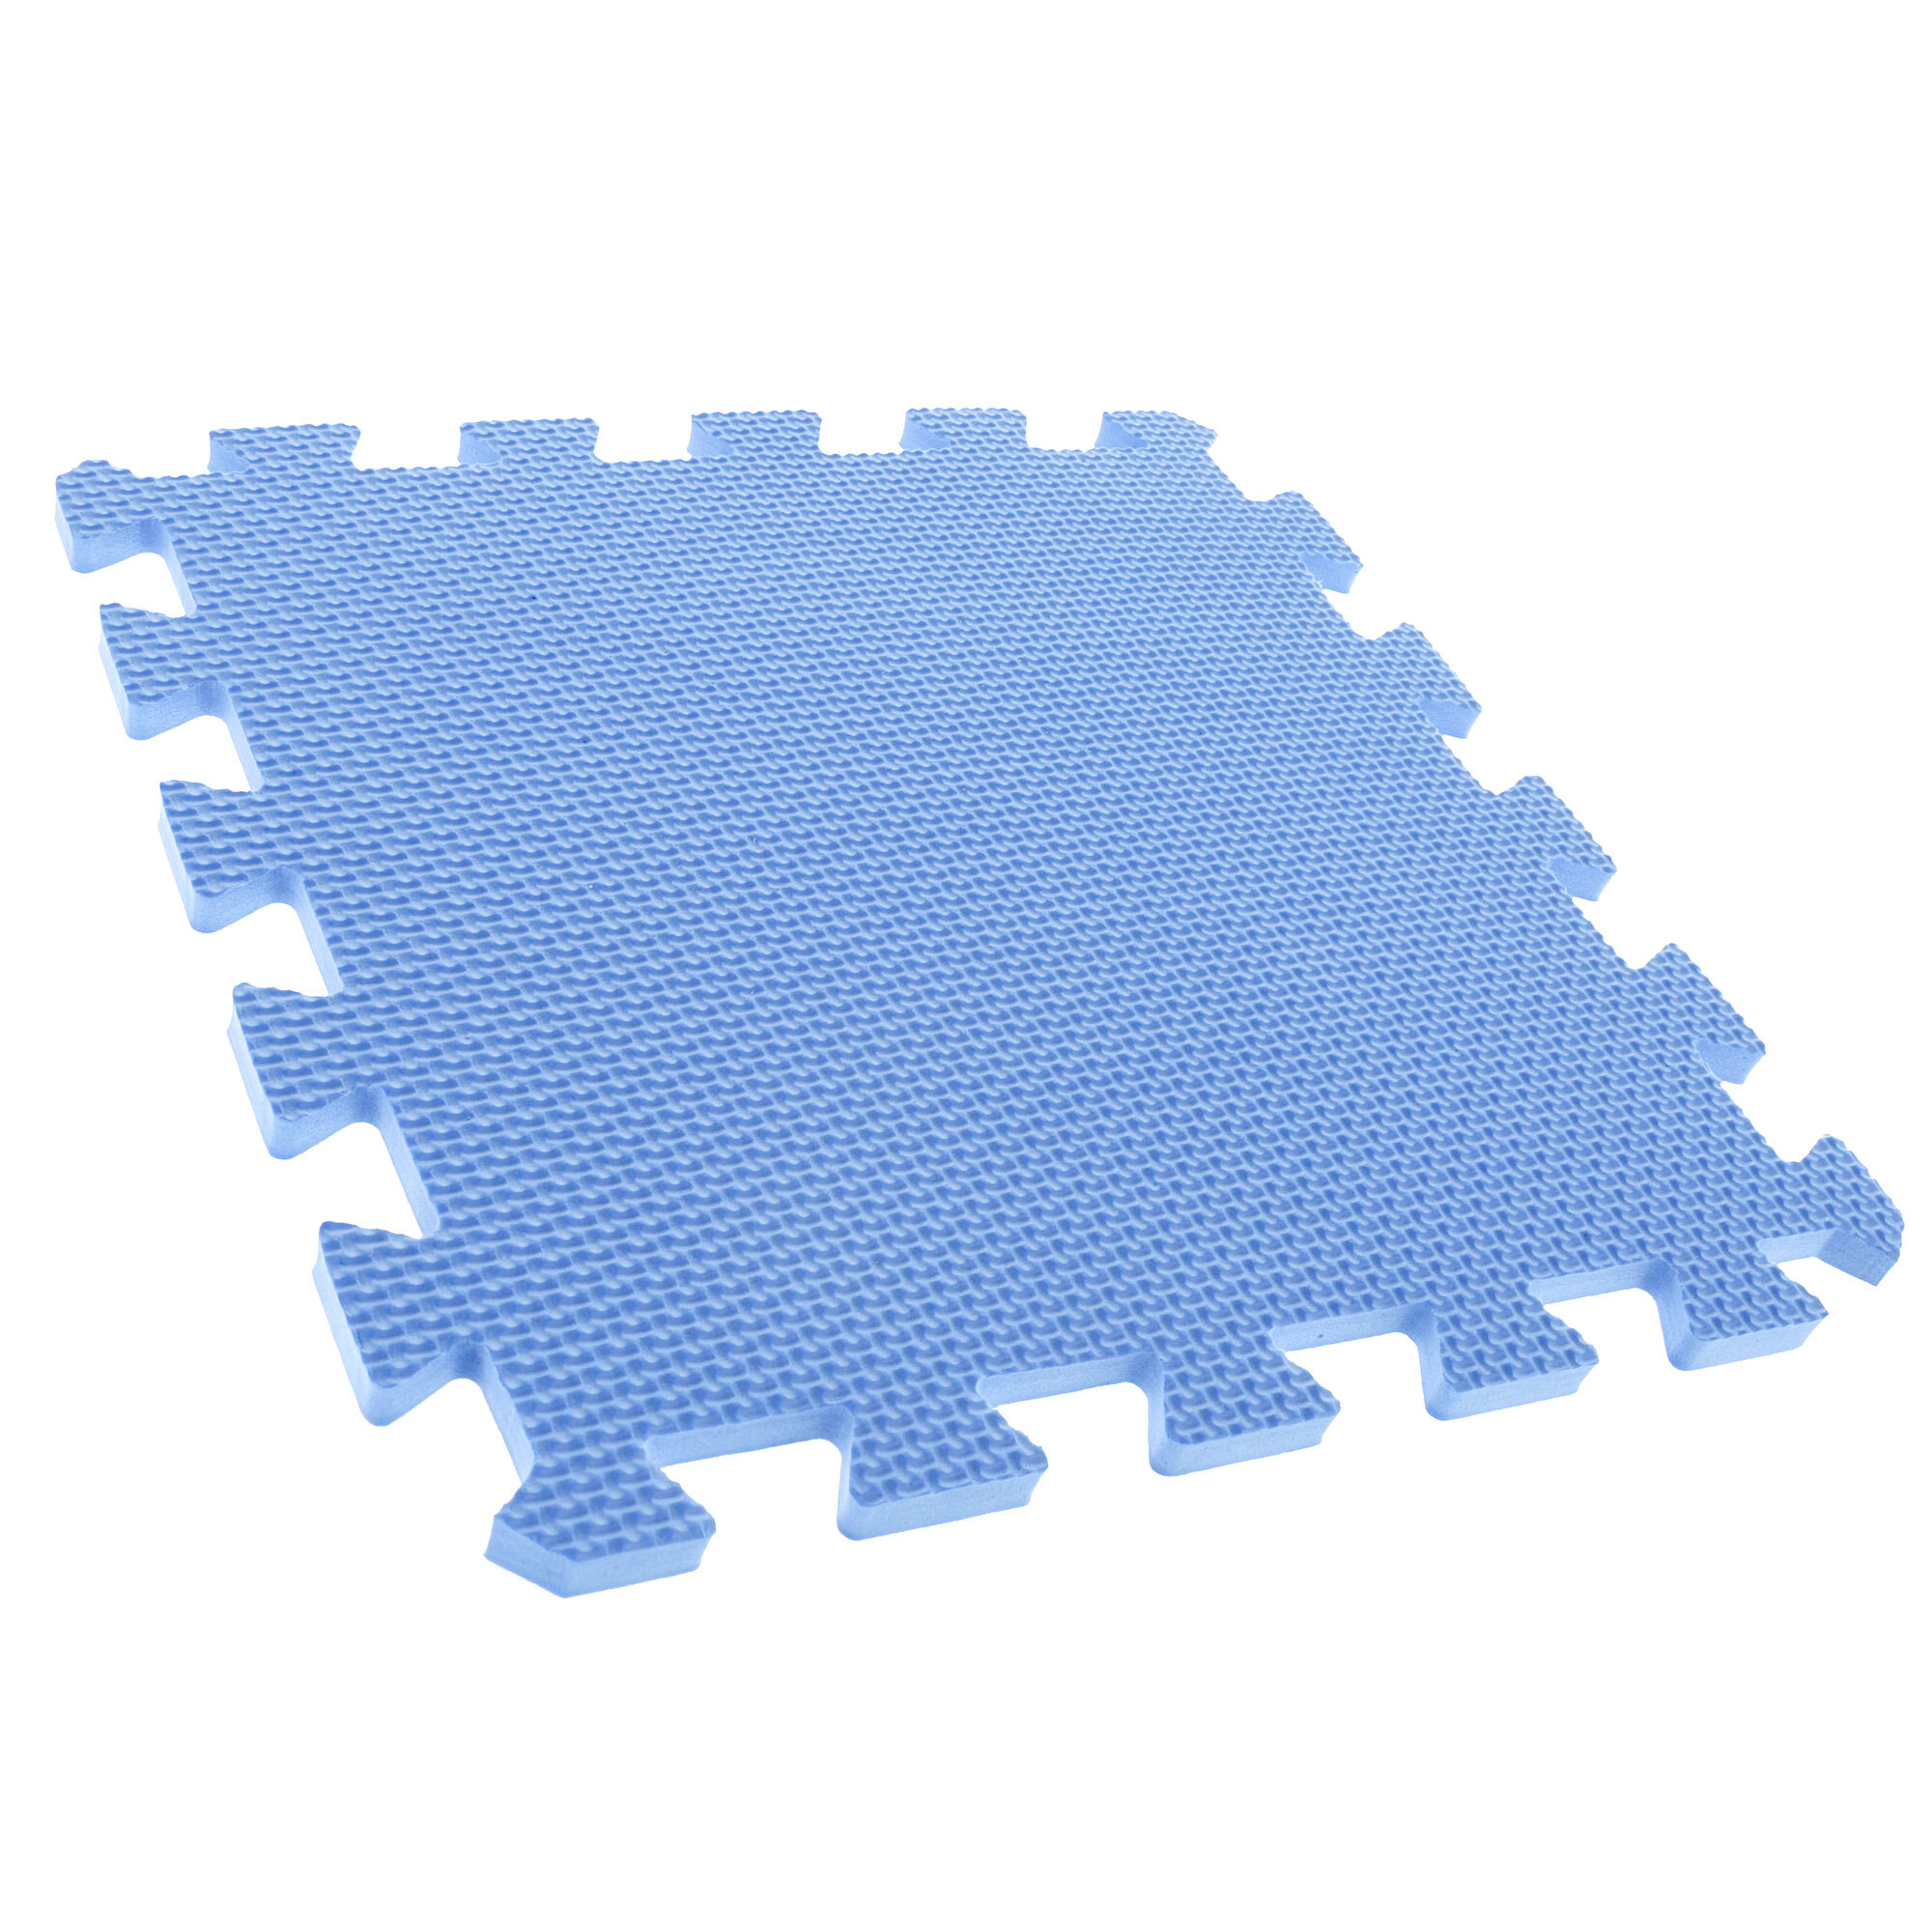 softfloor mat floor classic uk blue home product eva mats foam soft